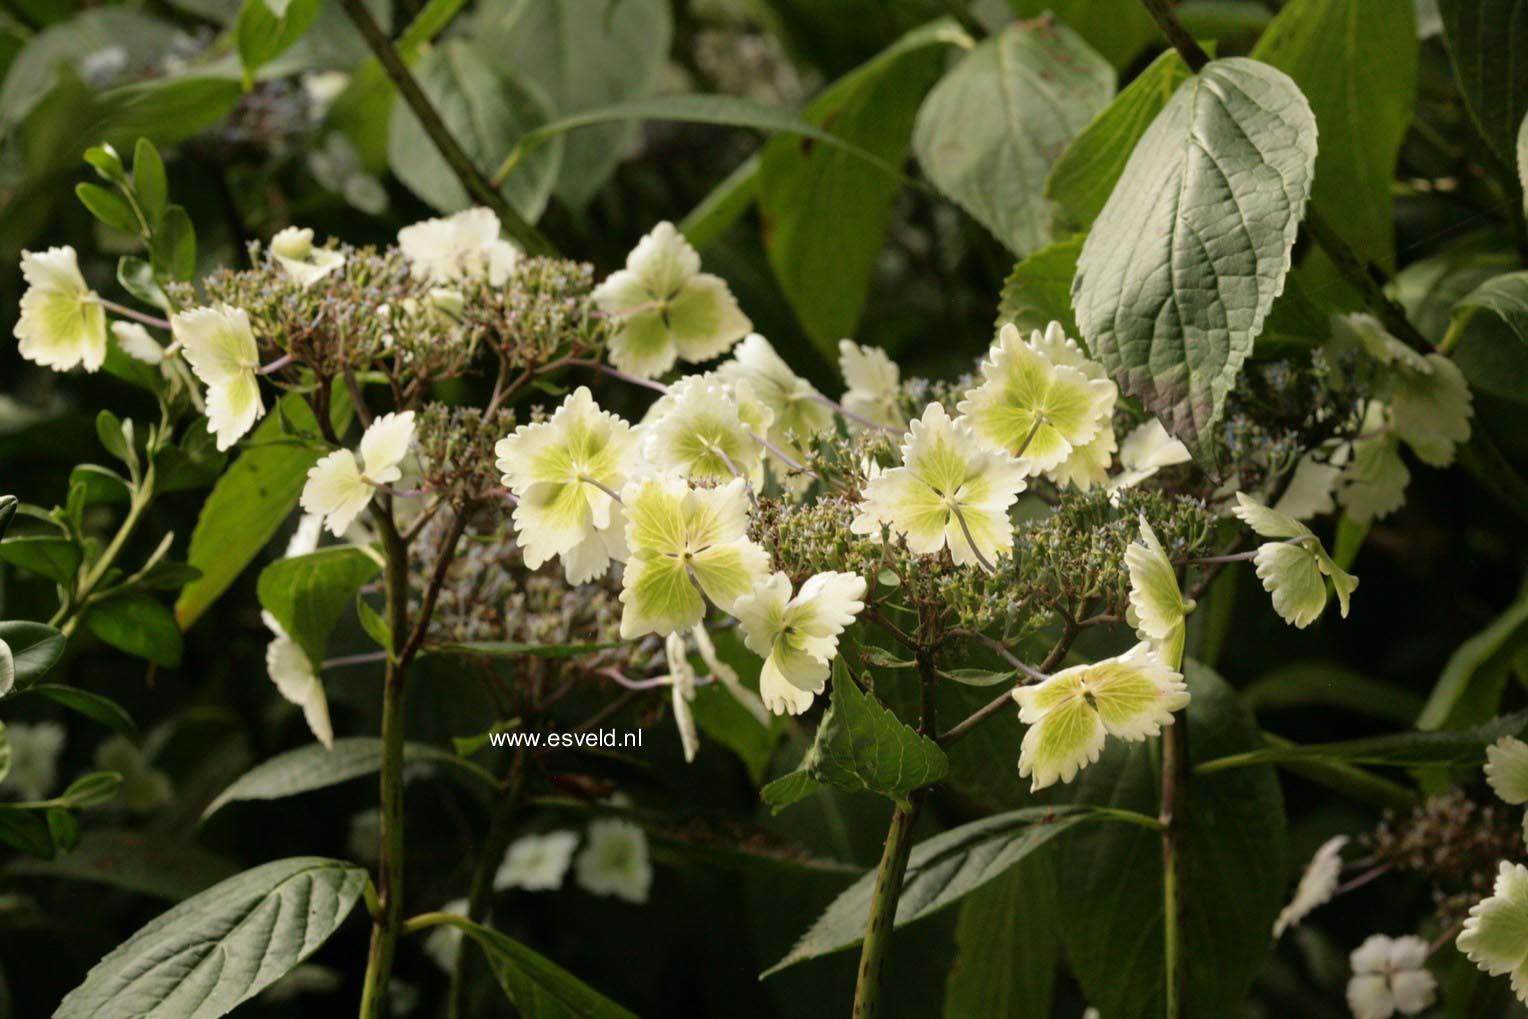 Hydrangea macrophylla 'Nadeshiko'